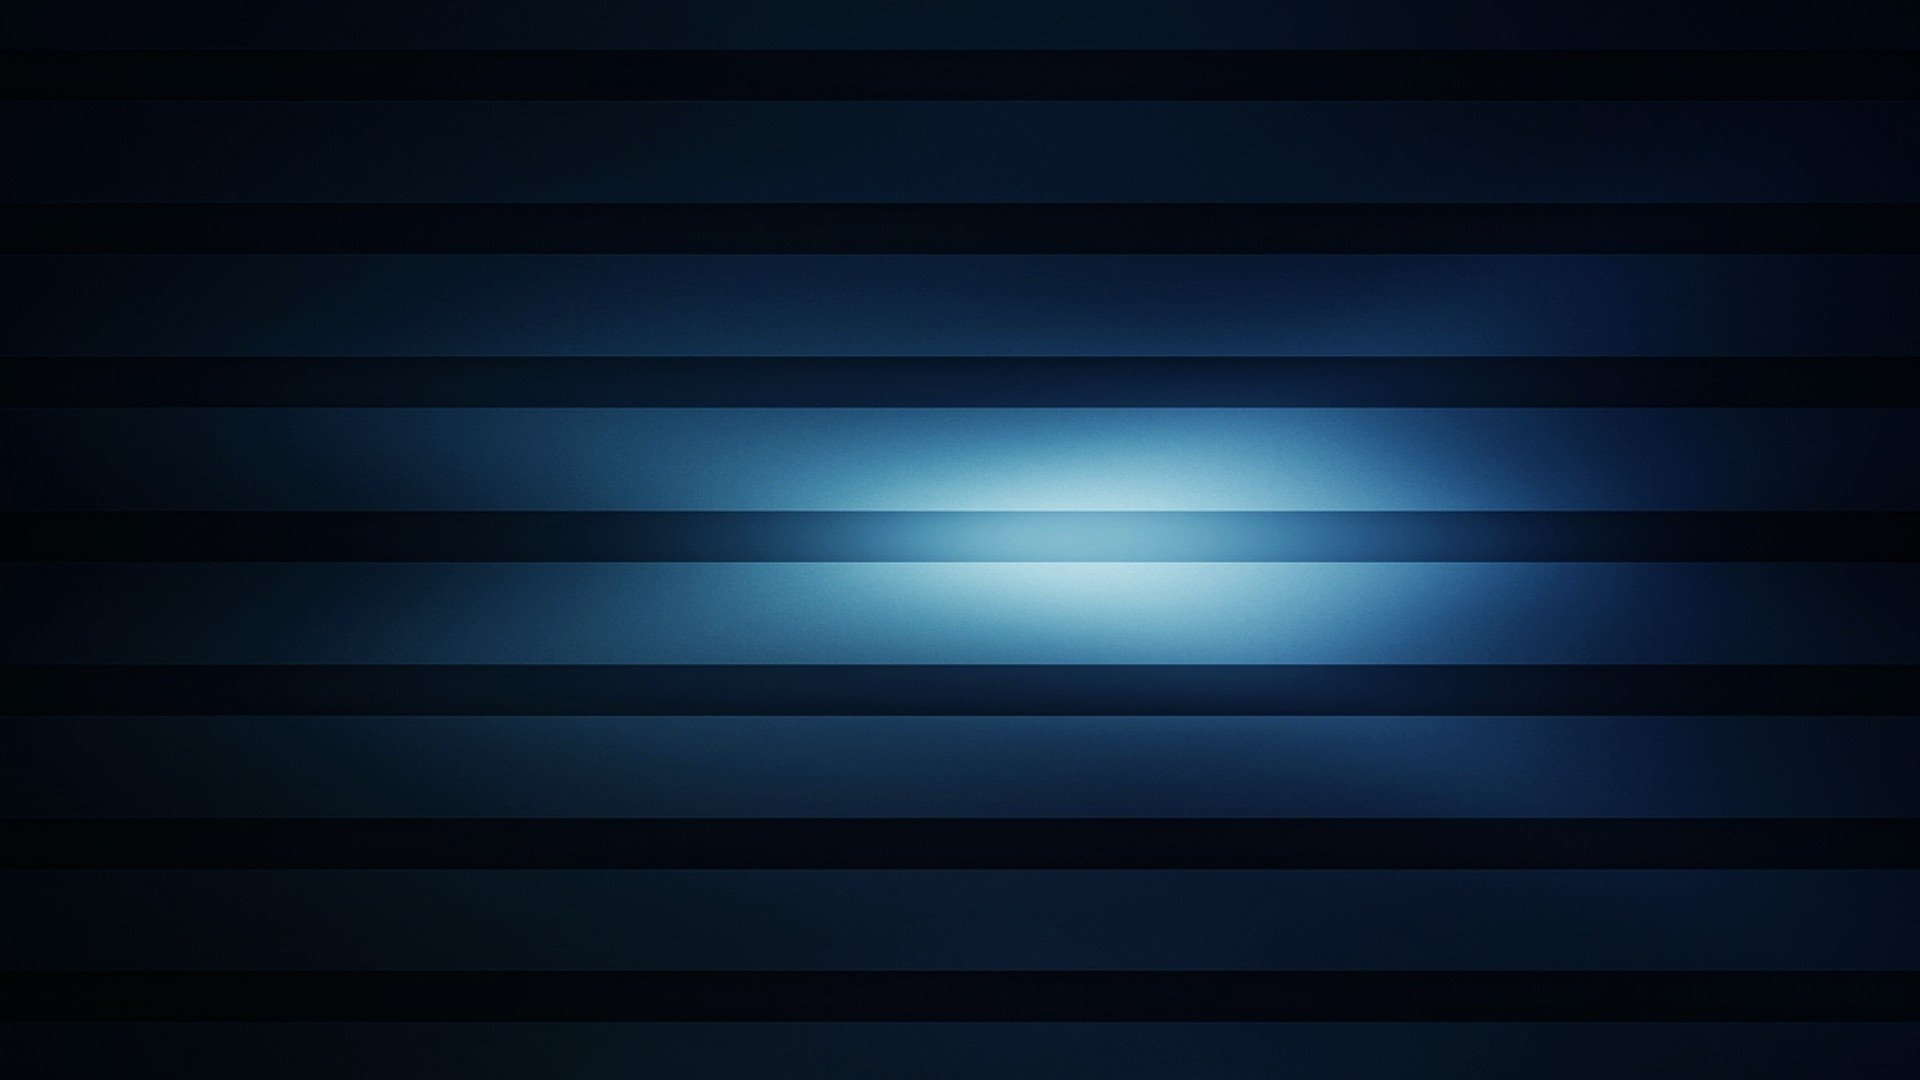 blue wallpaper iphone 8 plus